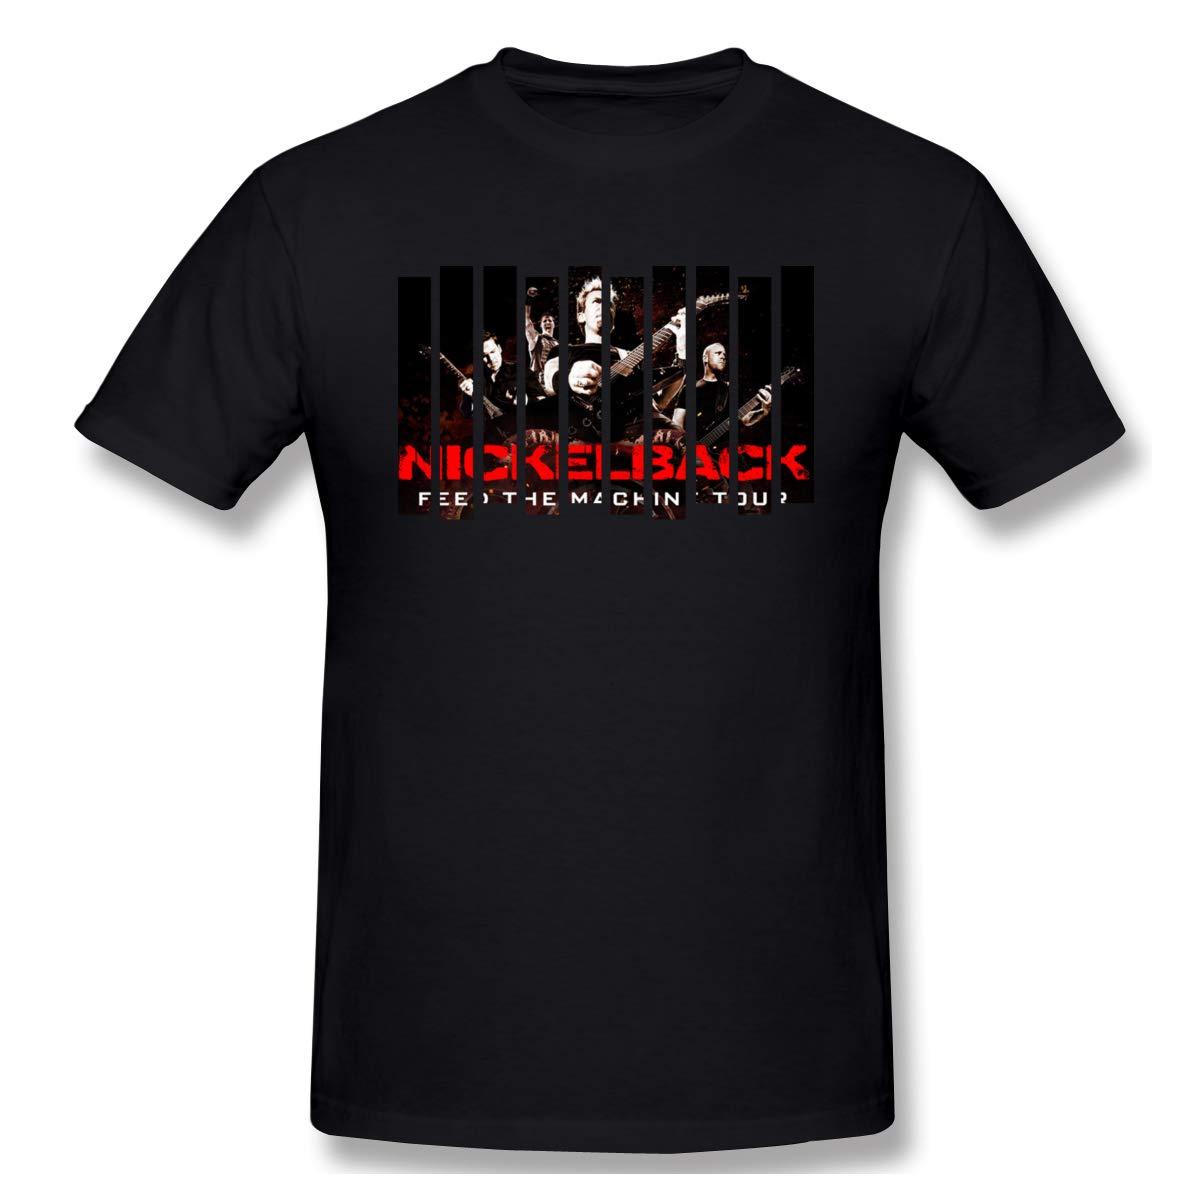 Alwaysuv S Logo Of Nickelback Classic Ts Shirts